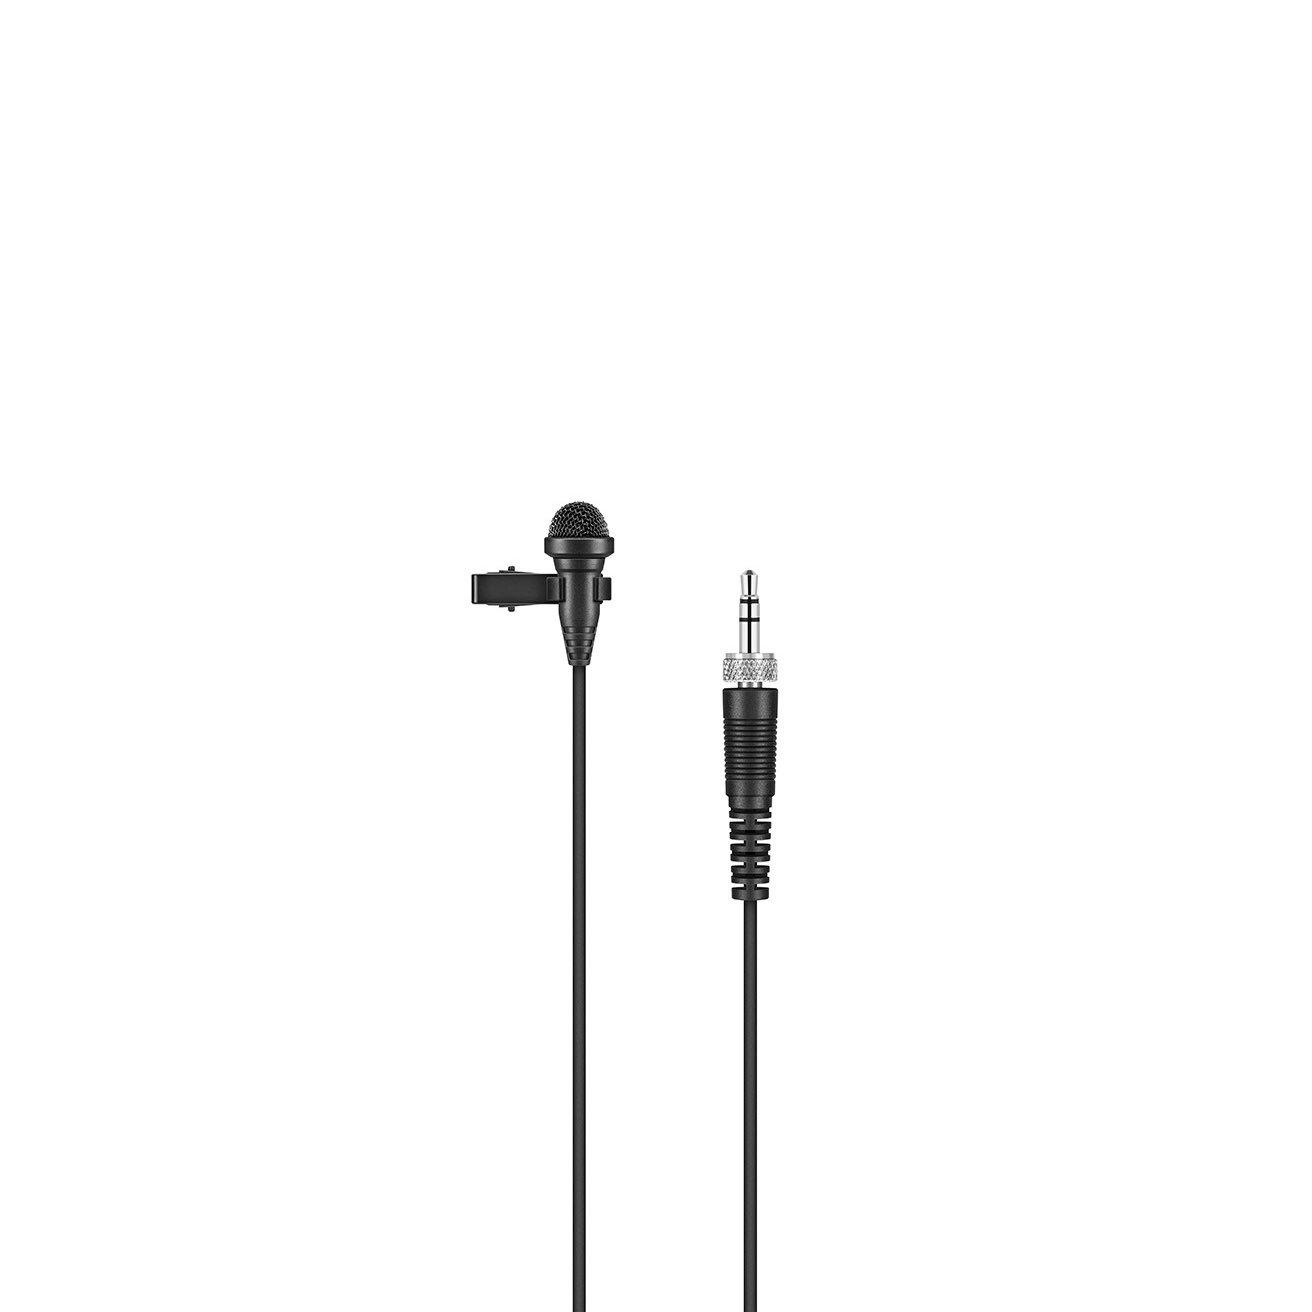 Amazon.com: Sennheiser HSP 4-EW MKE platinum condenser capsule with a  cardioid microphone: Musical Instruments